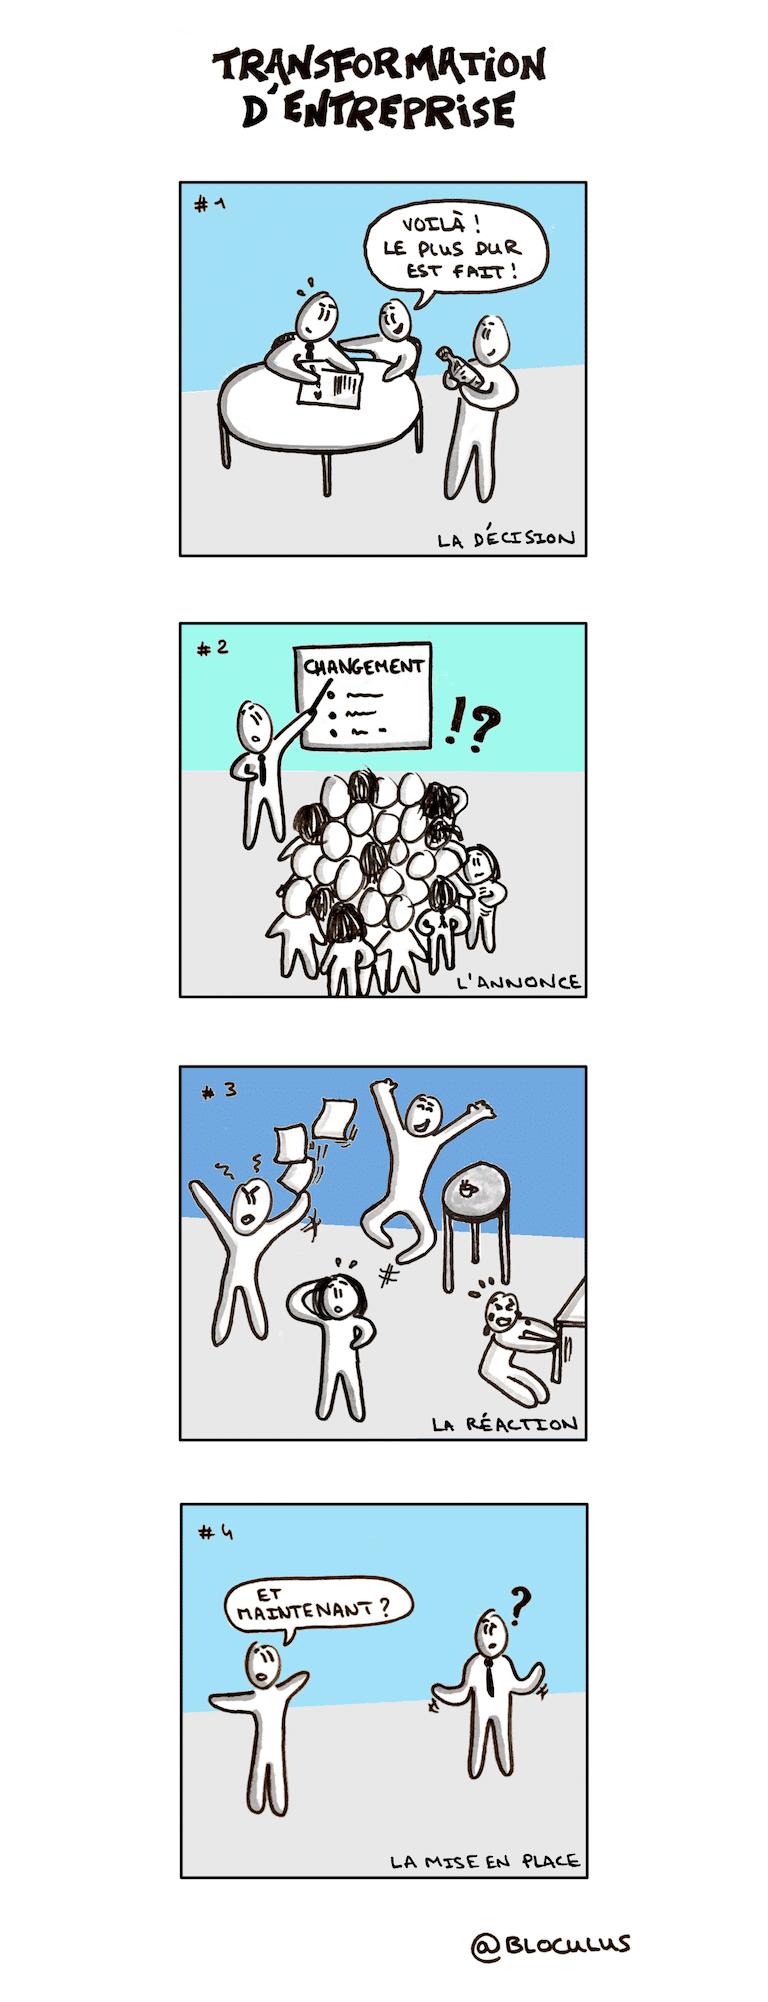 Transformation en entreprise